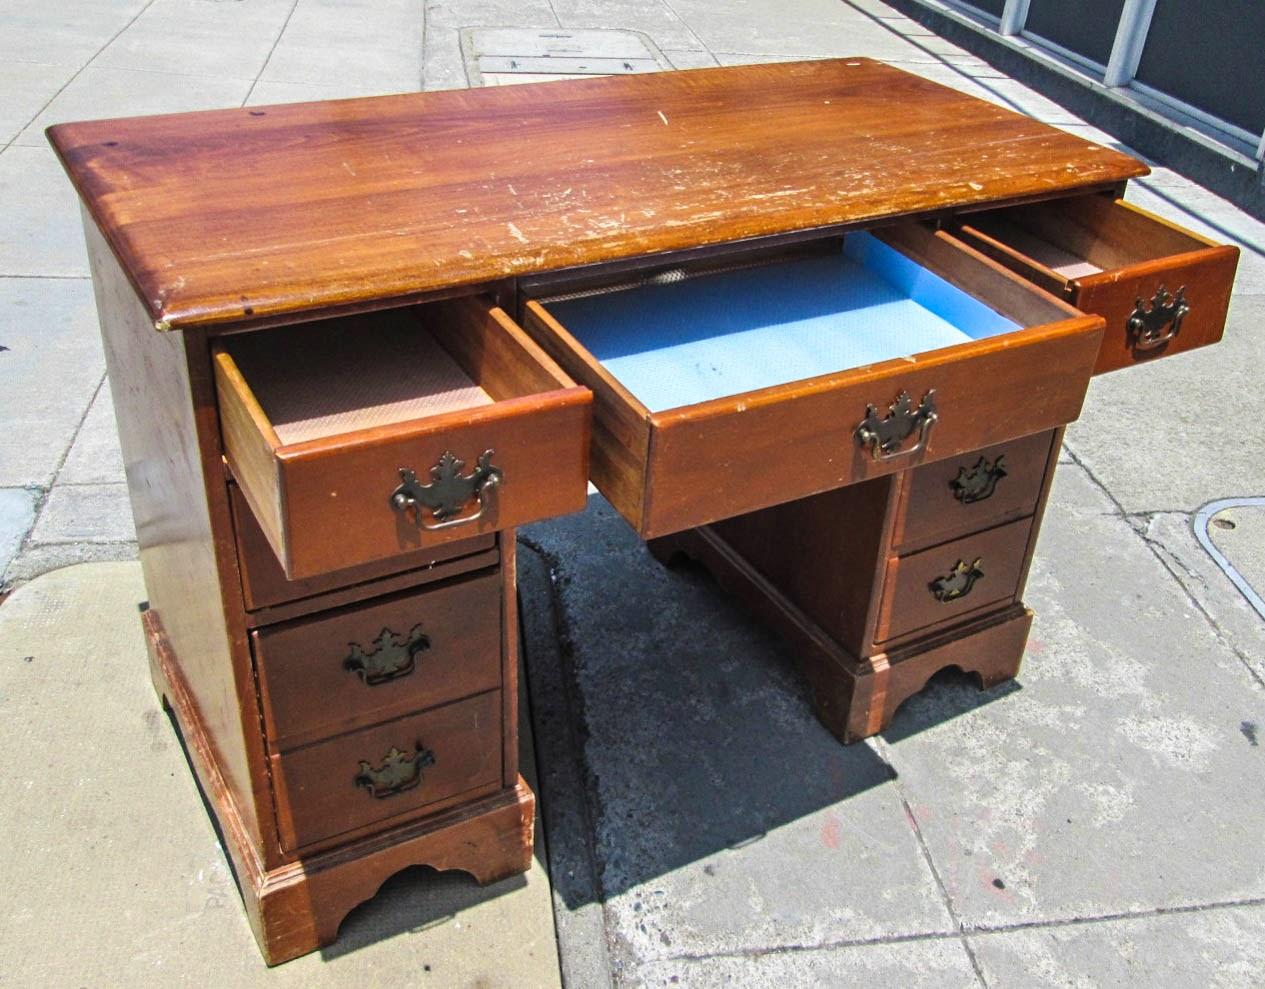 Reliable Student Wooden Desk htpcworkscom AweInspiring